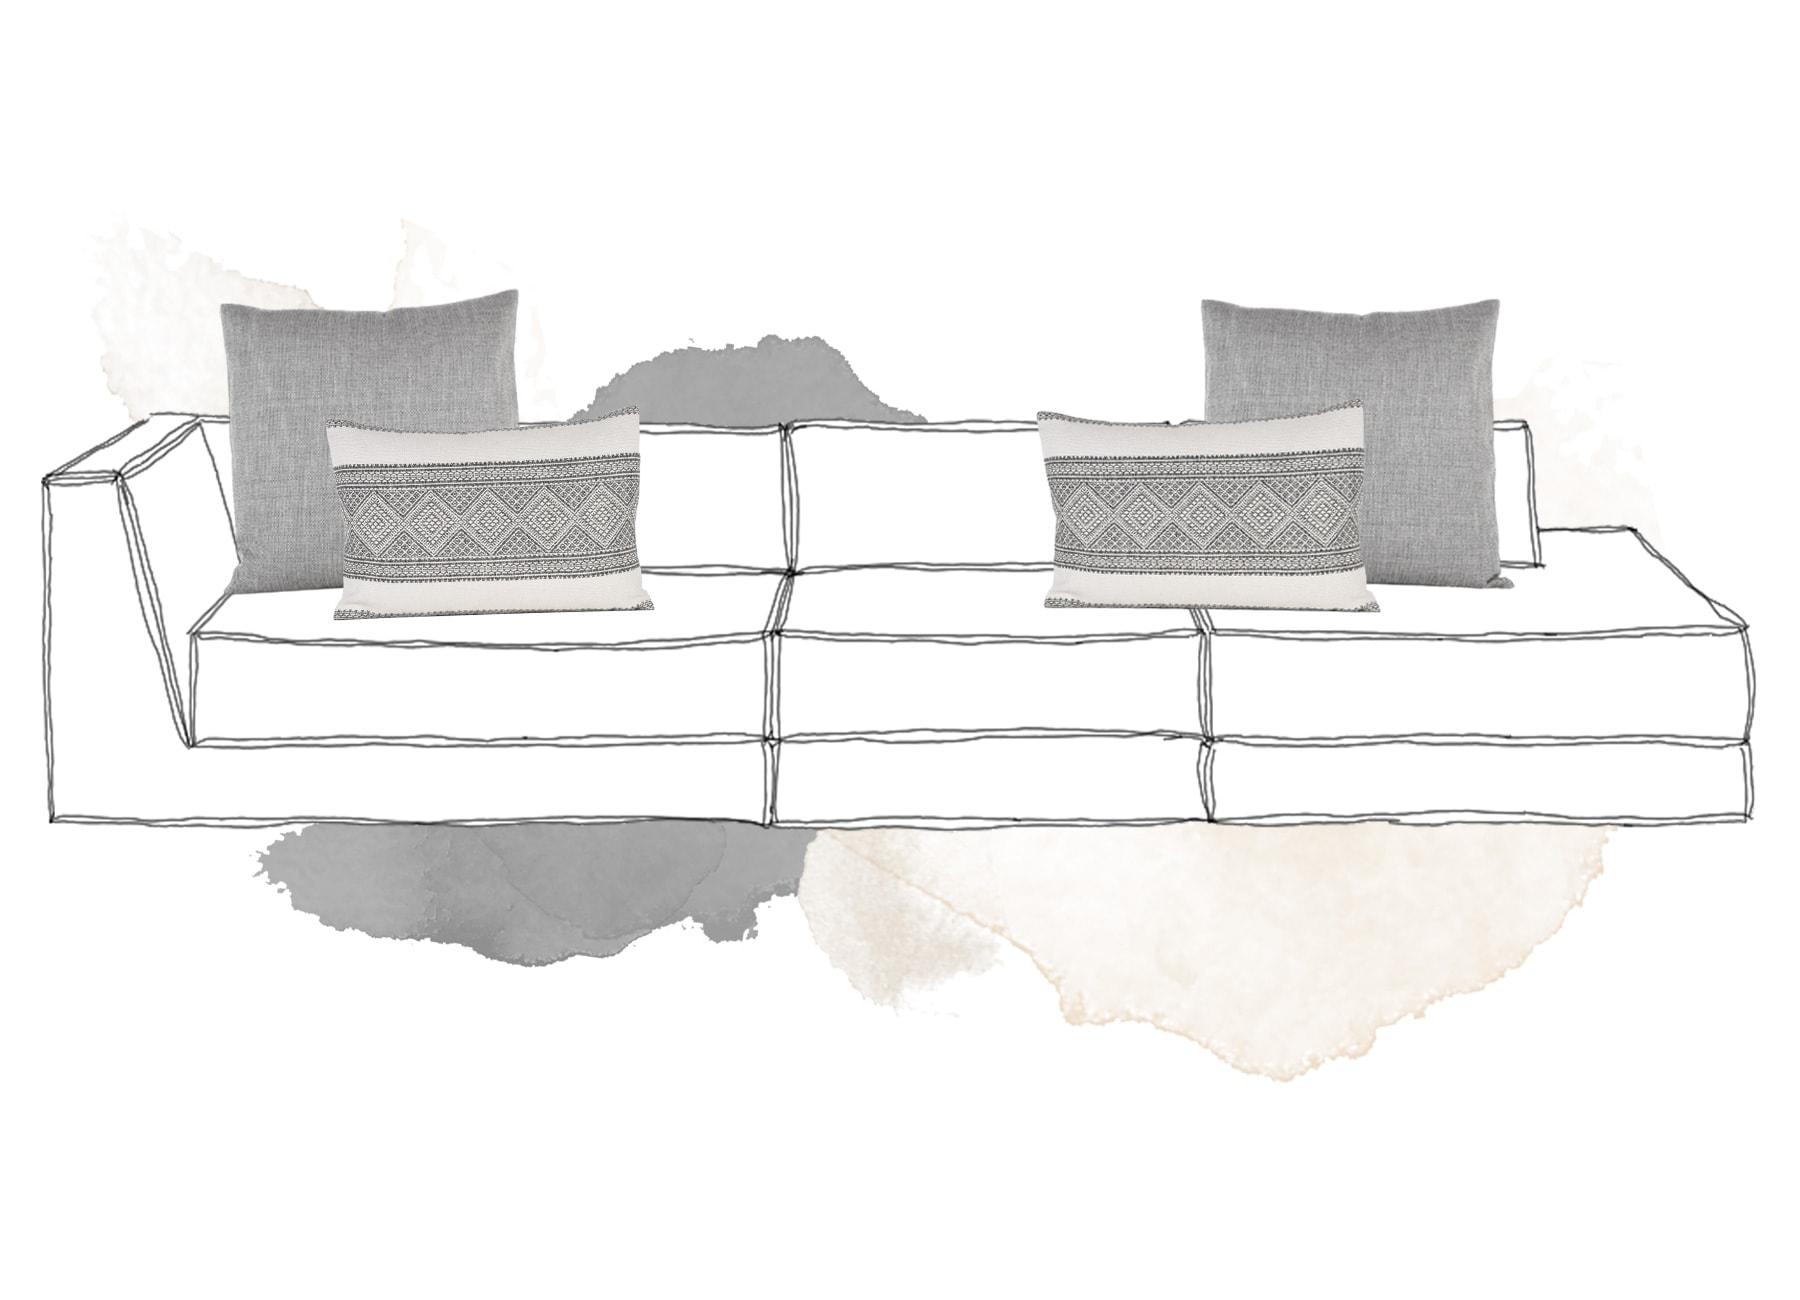 Sofakissen Inspiration in Grau